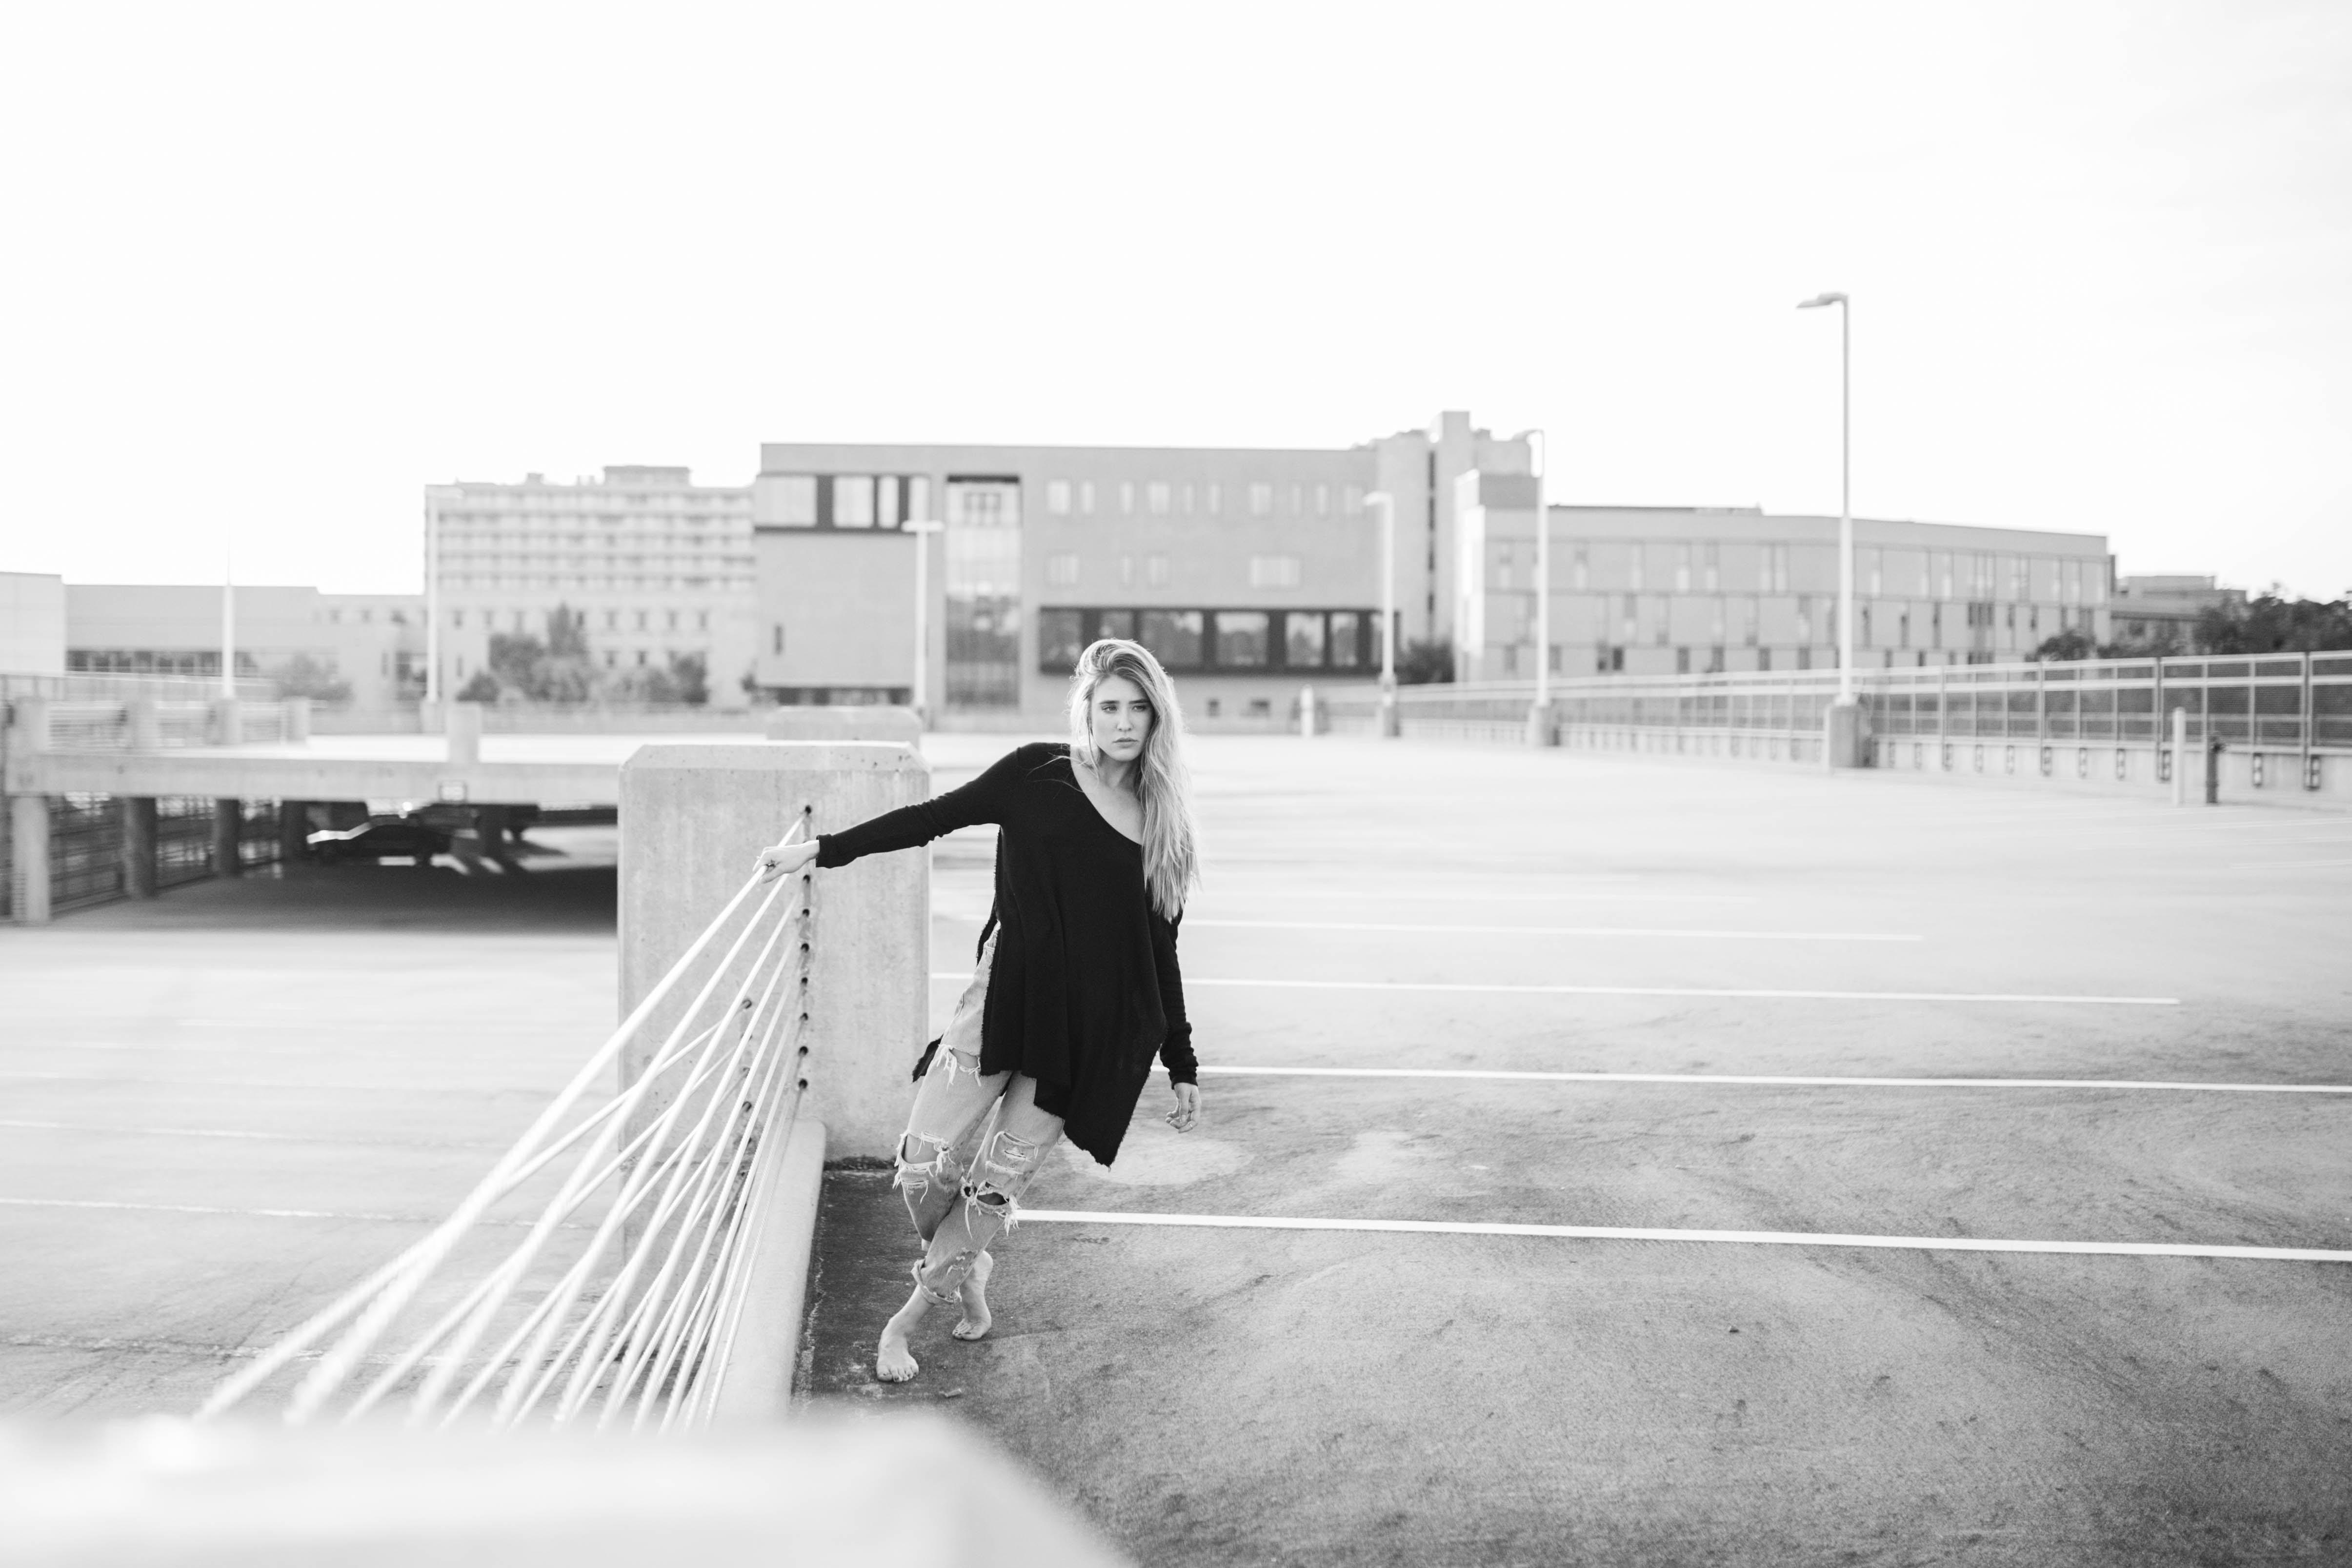 Free Unsplash photo from Brooke Cagle